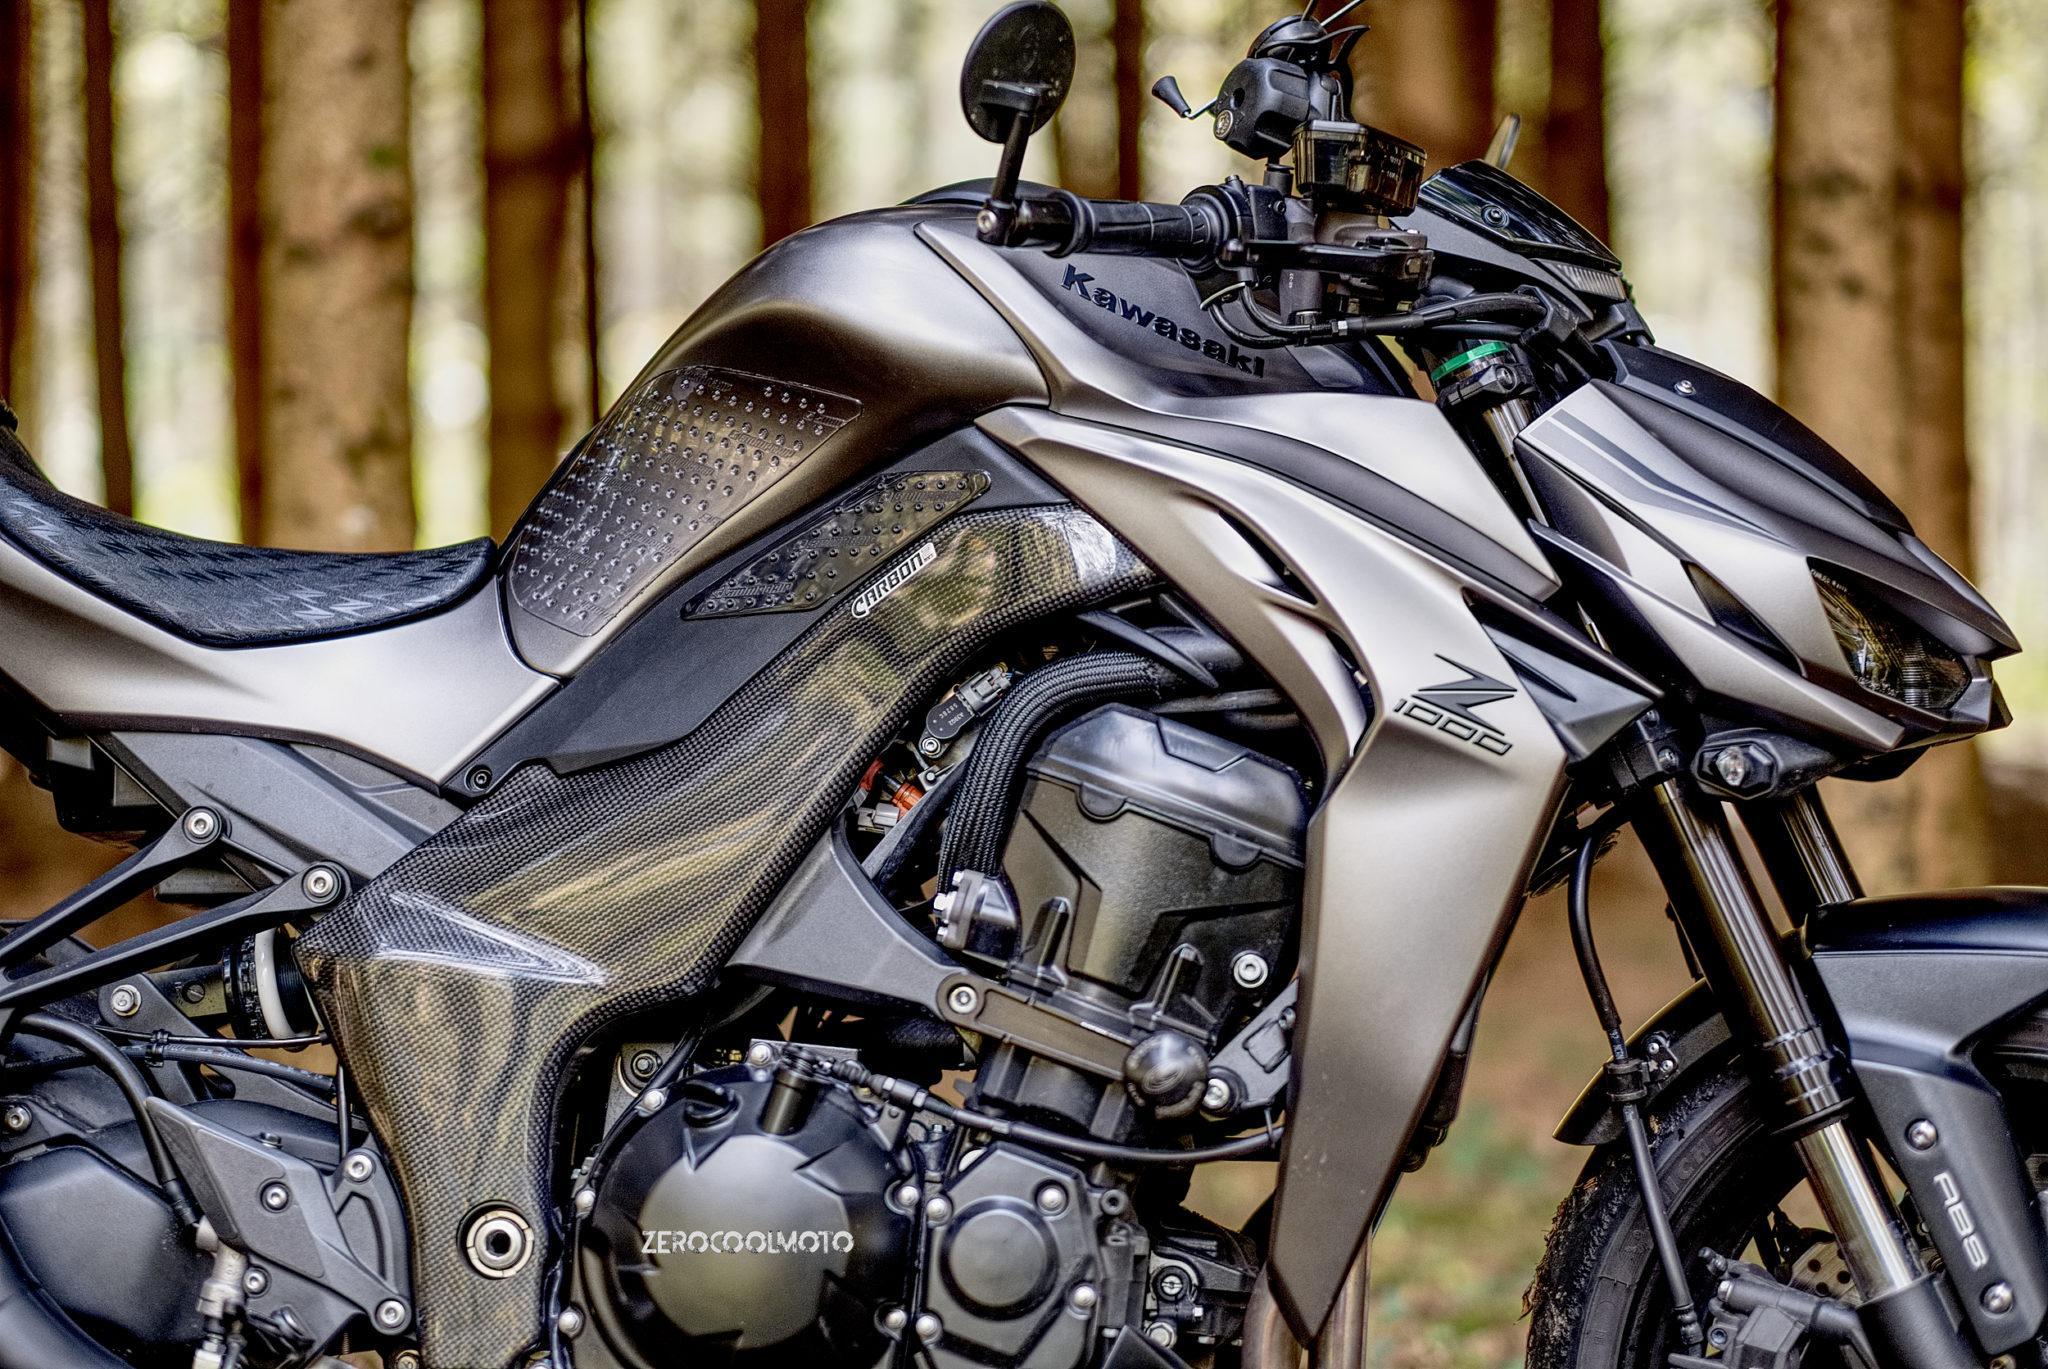 Kawasaki Z1000 2014 2017 Carbon Fiber Frame Covers